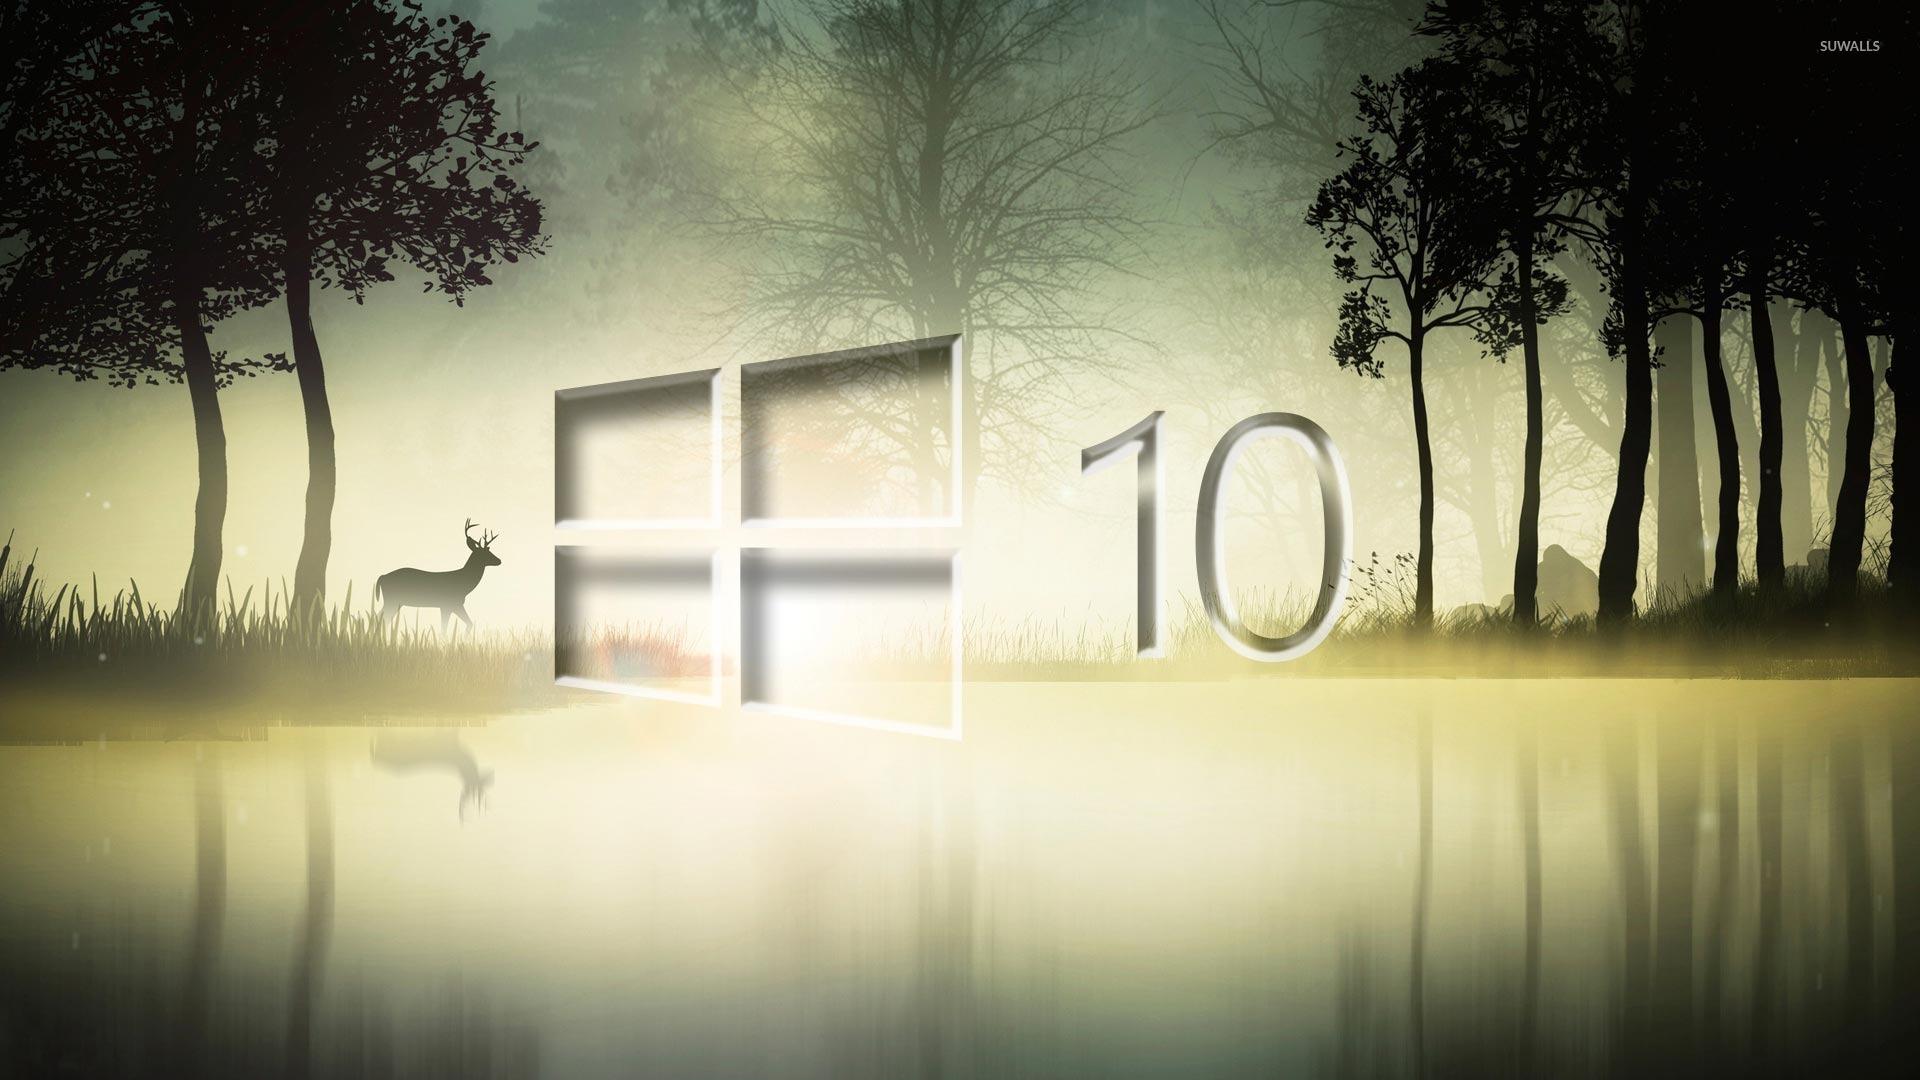 1920x1080px Windows 10 Fog Wallpaper - WallpaperSafari